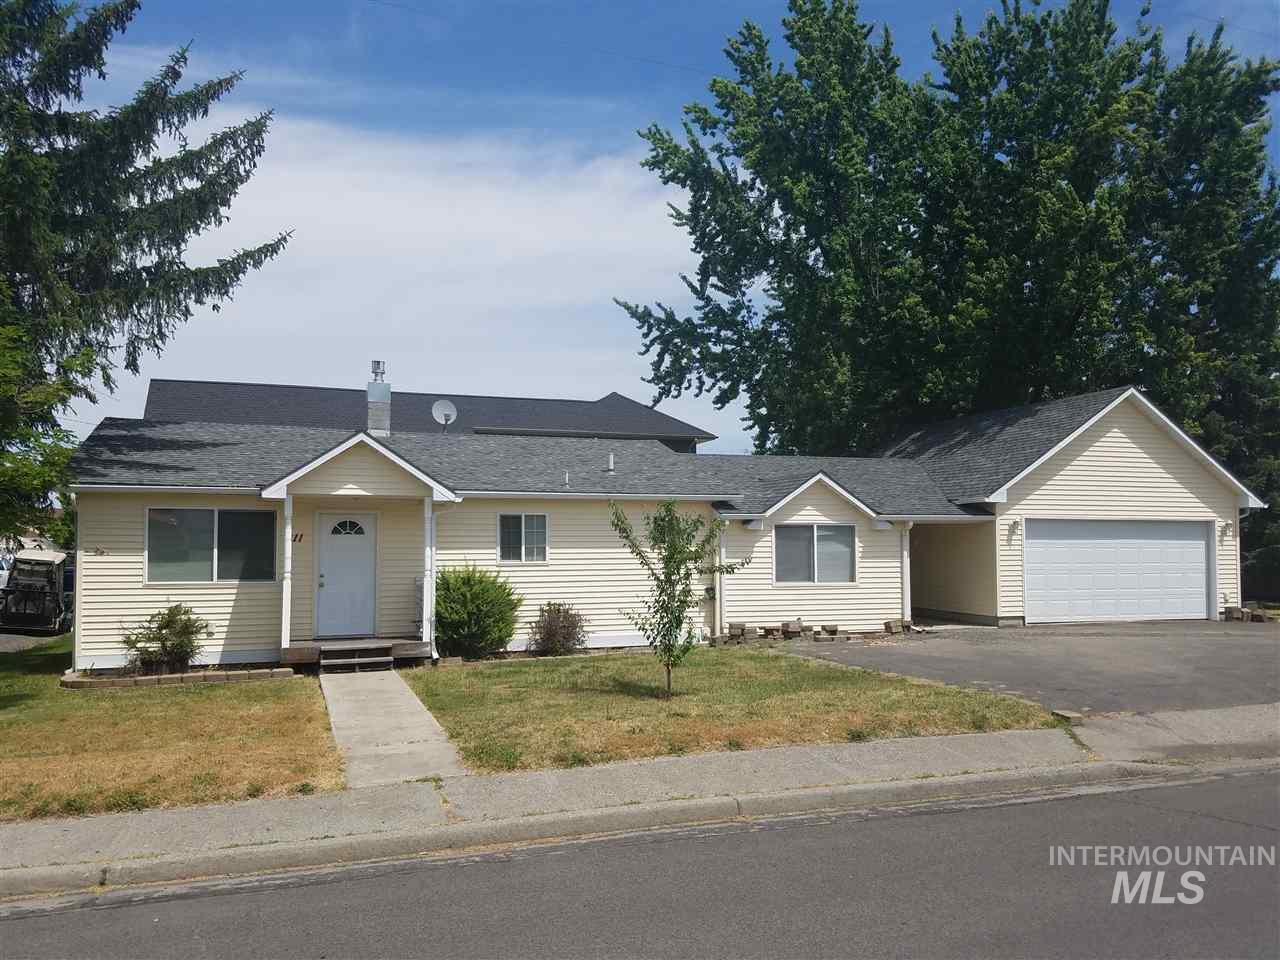 独户住宅 为 销售 在 211 Madison 211 Madison Grangeville, 爱达荷州 83530